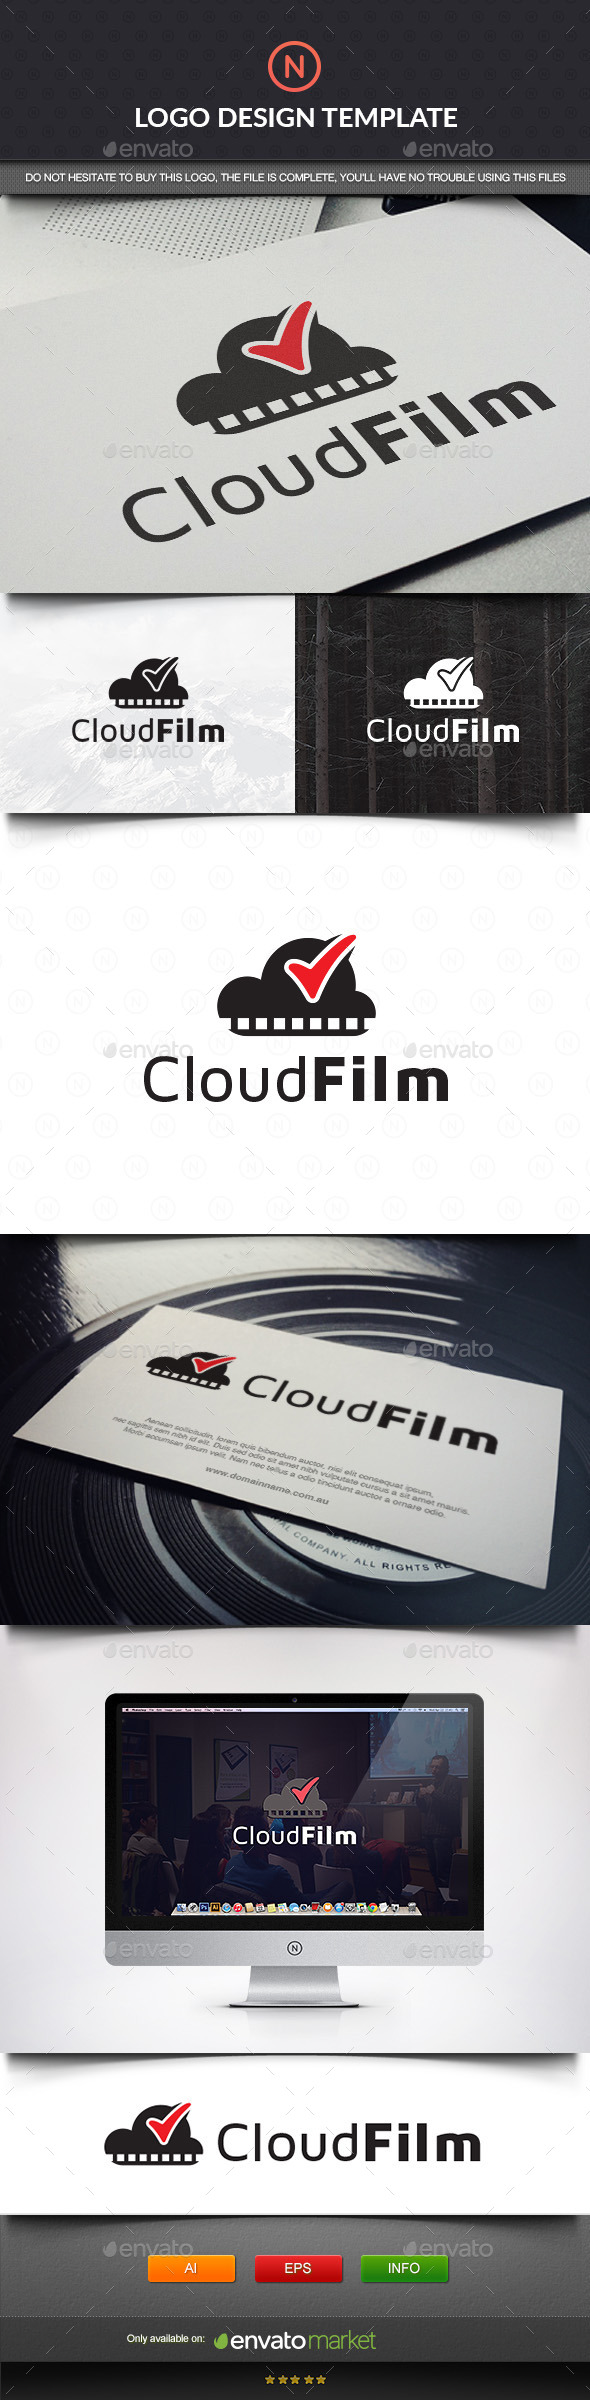 Cloud Film Check